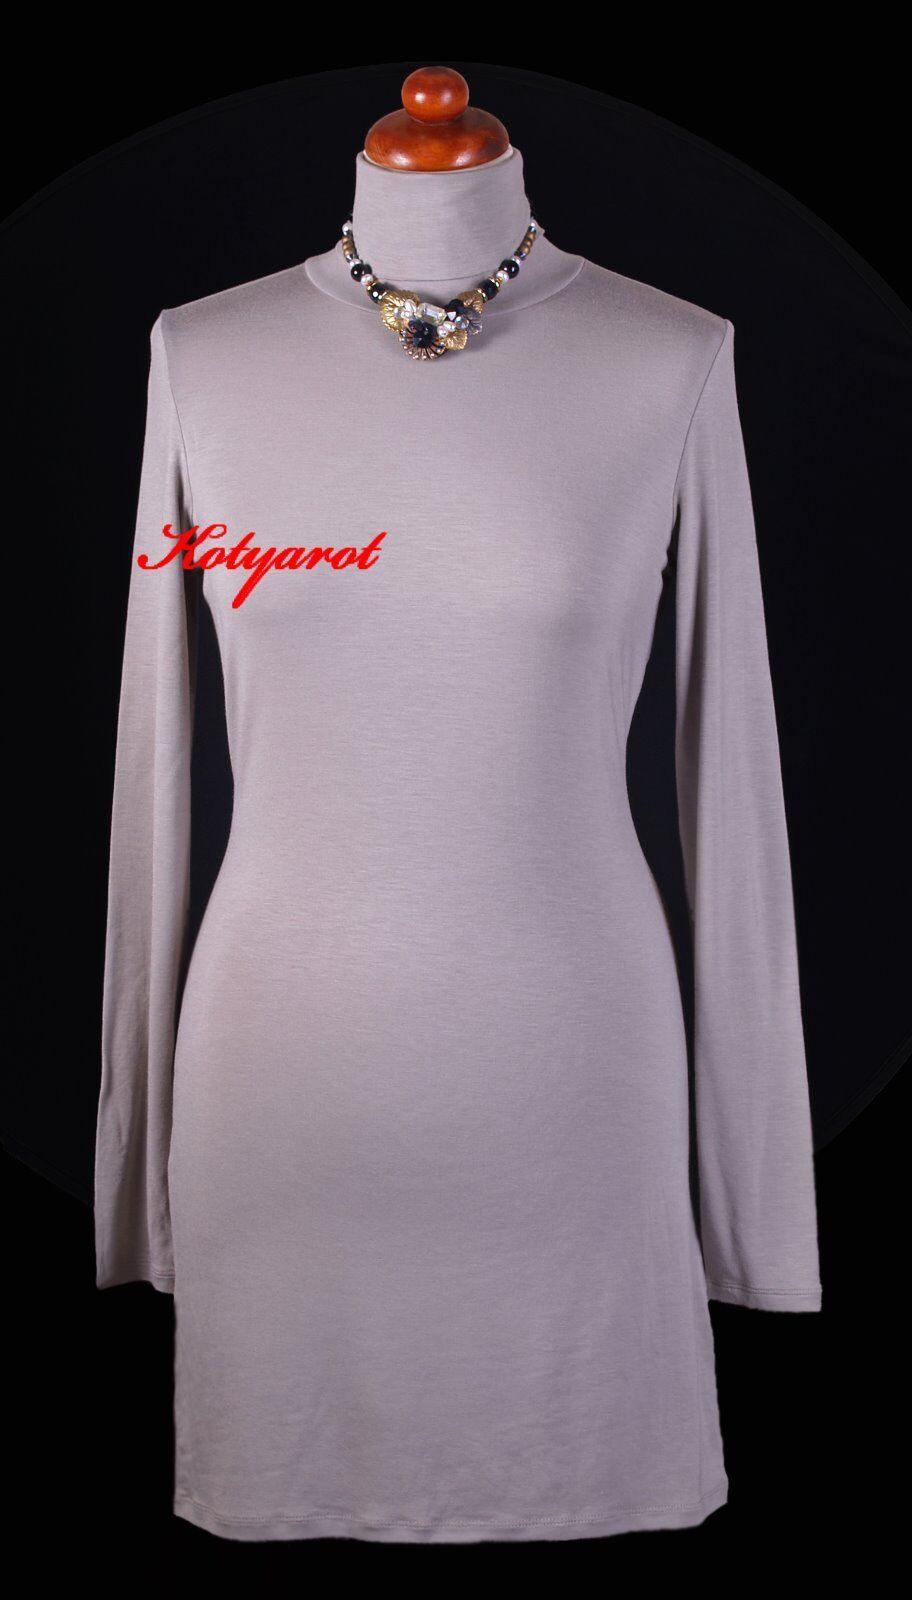 REPEAT Stretch Kleid Long Shirt NEU Gr. 38 Taupe dunkel Grau - Braun